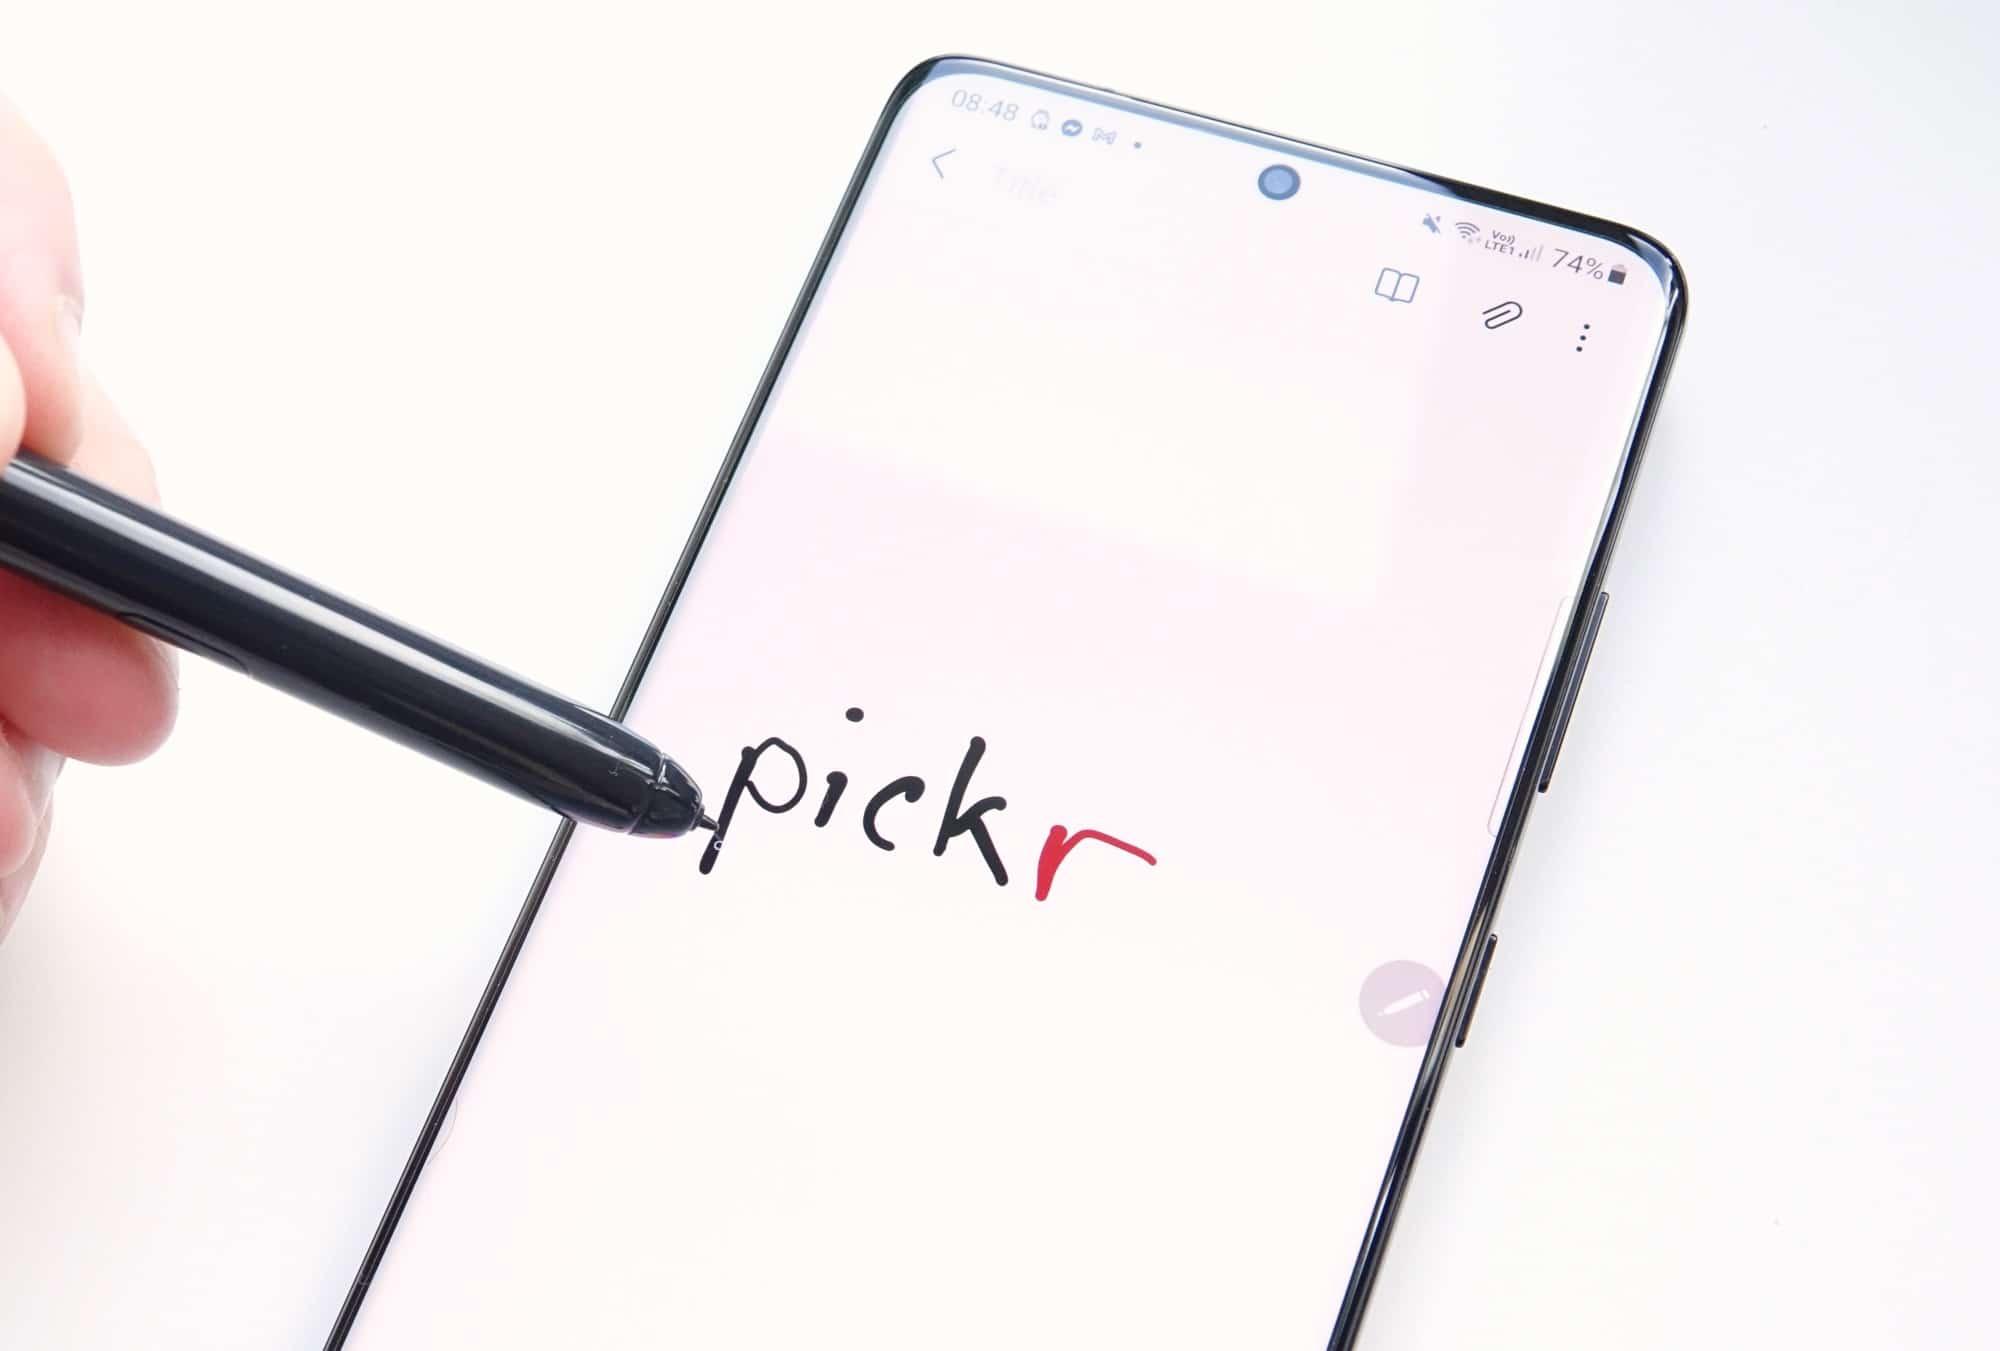 Samsung Galaxy S21 Ultra 5G and an S-Pen